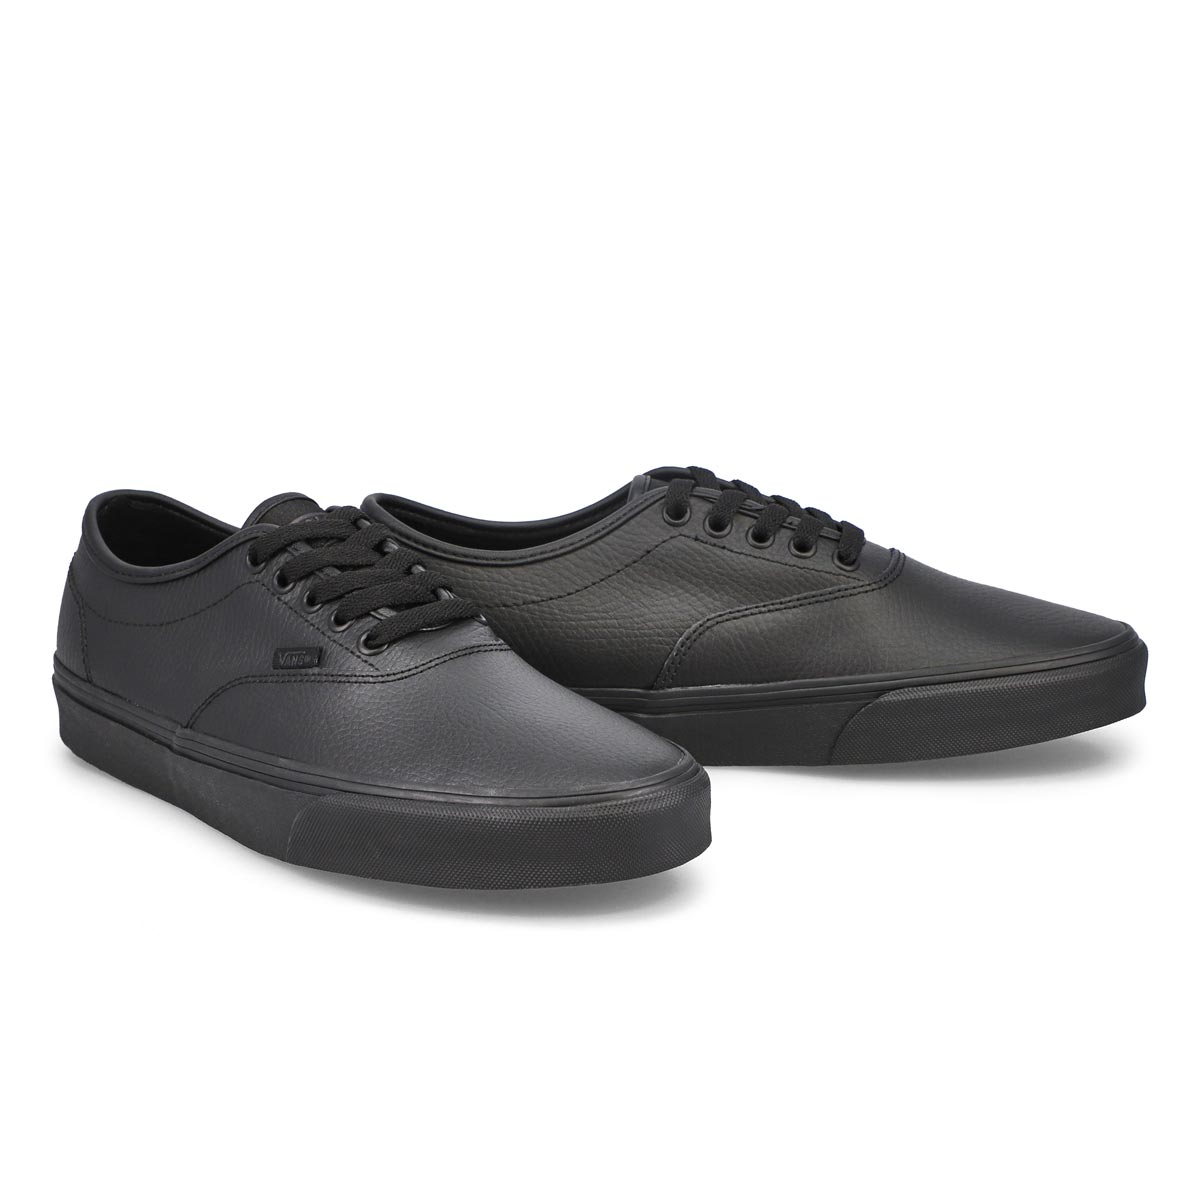 Men's DOHENY DECON black/black lace up sneakers